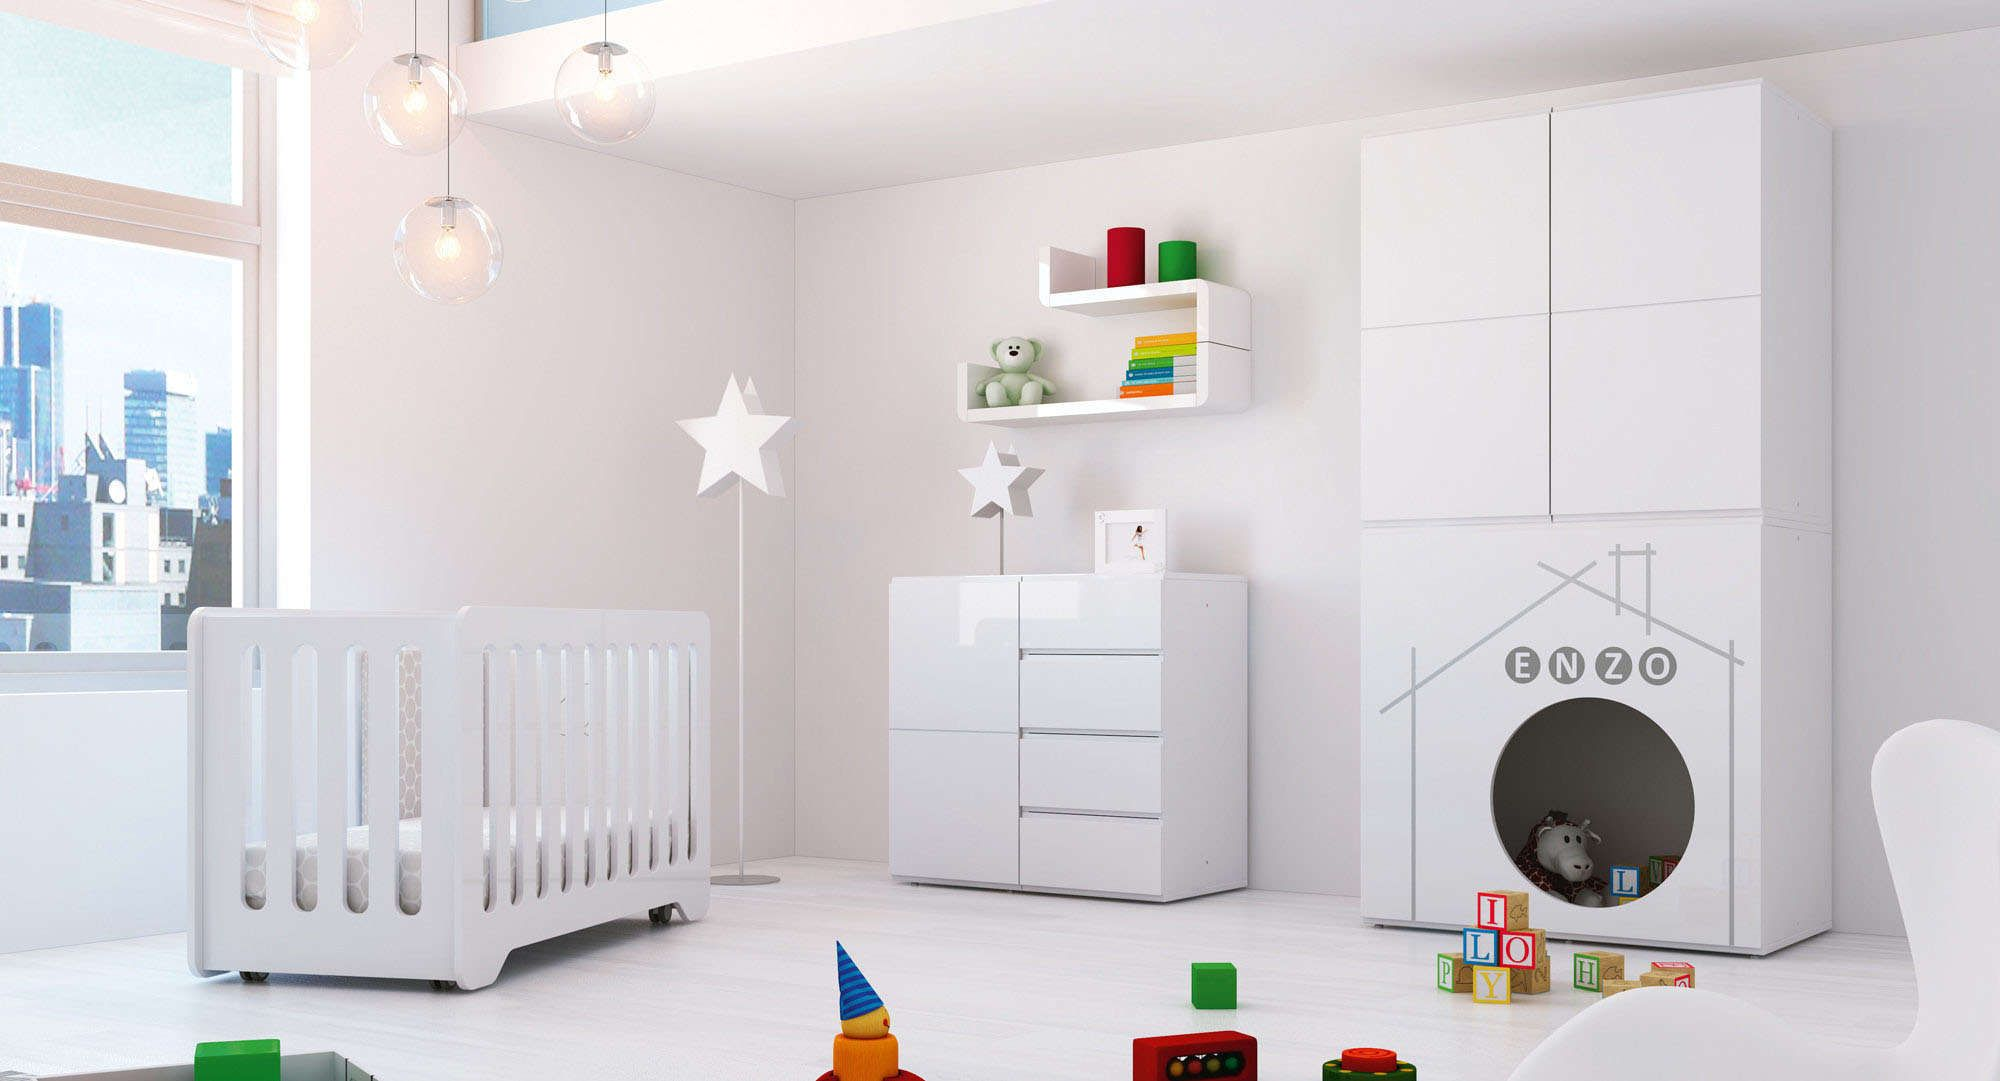 Room MODULAR HOUSE Alondra Habitaci n de dise o y moderna de